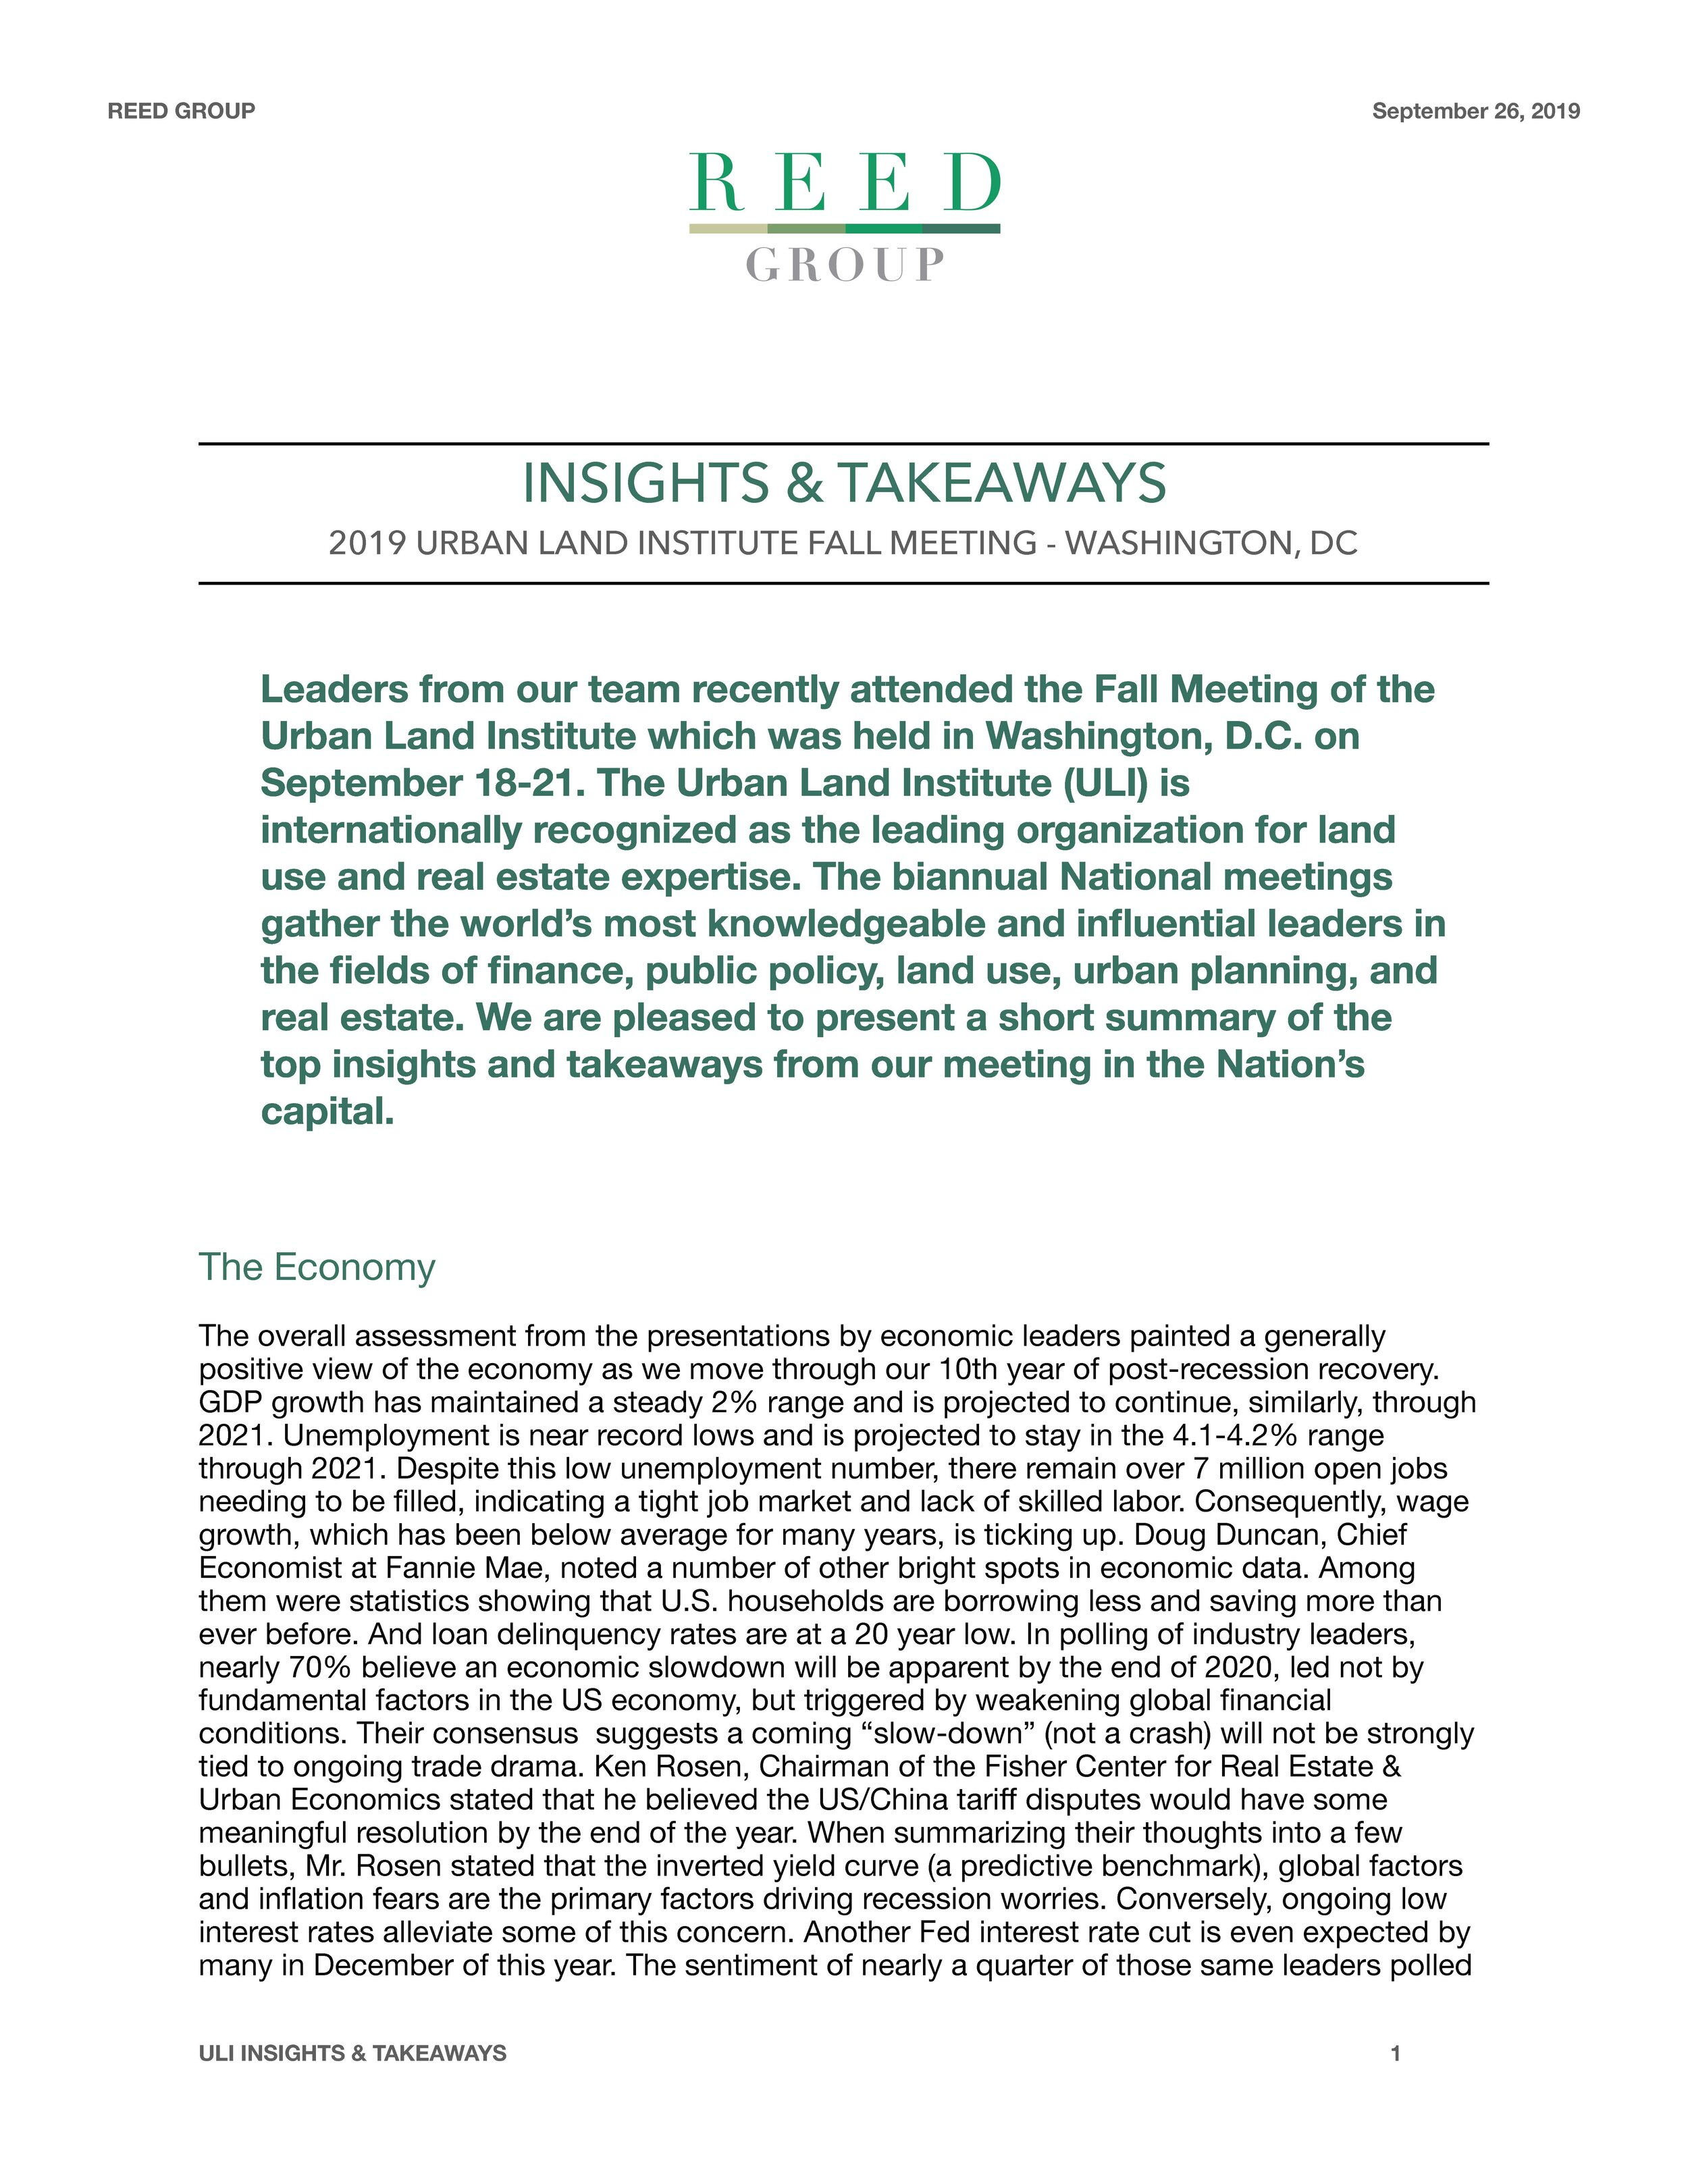 Reed Group - ULI INSIGHTS Fall 19 Final_Page_1.jpg